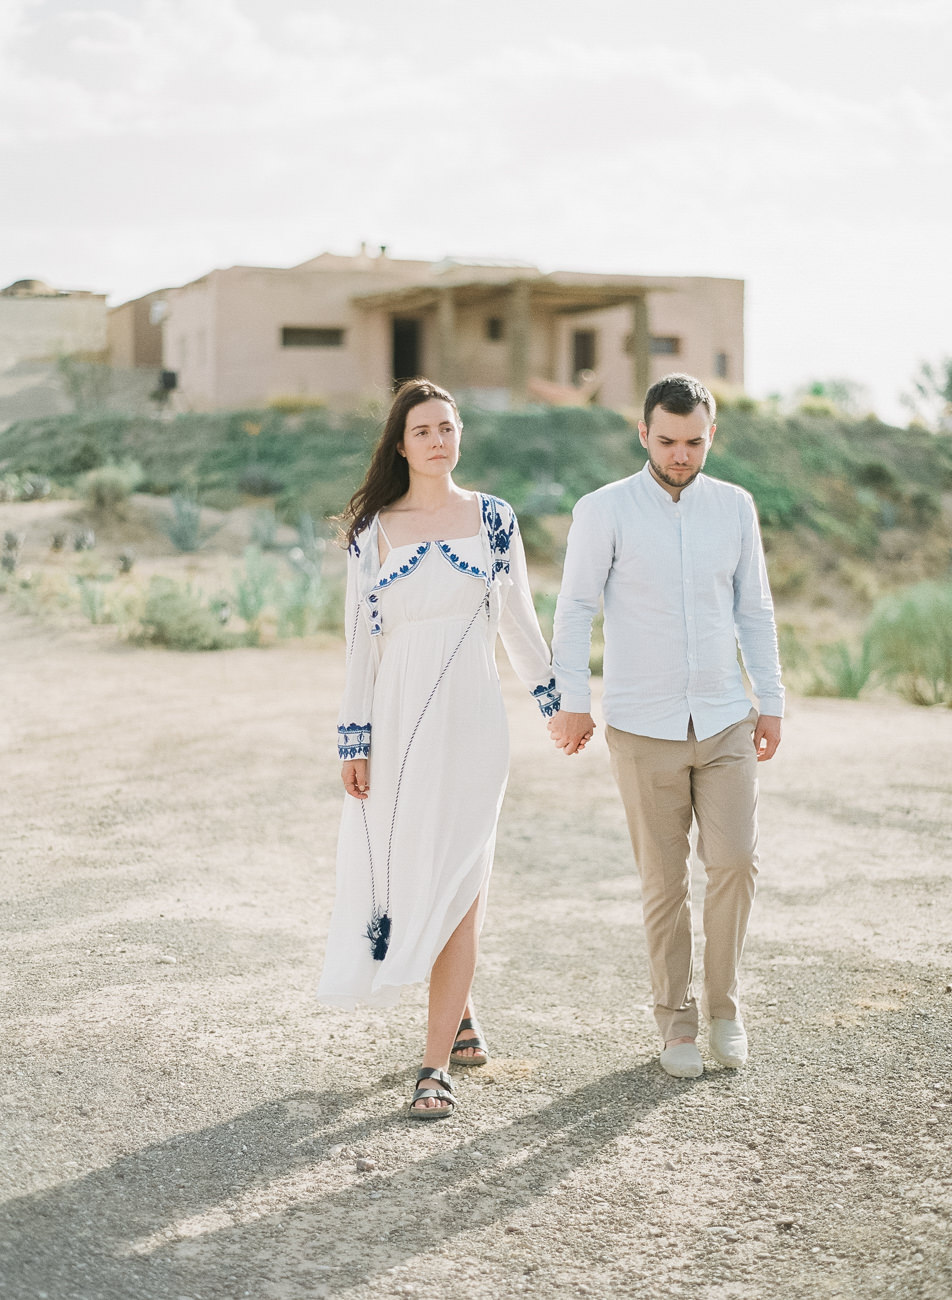 marrakech-photographe-mariage-alain-m-39.jpg